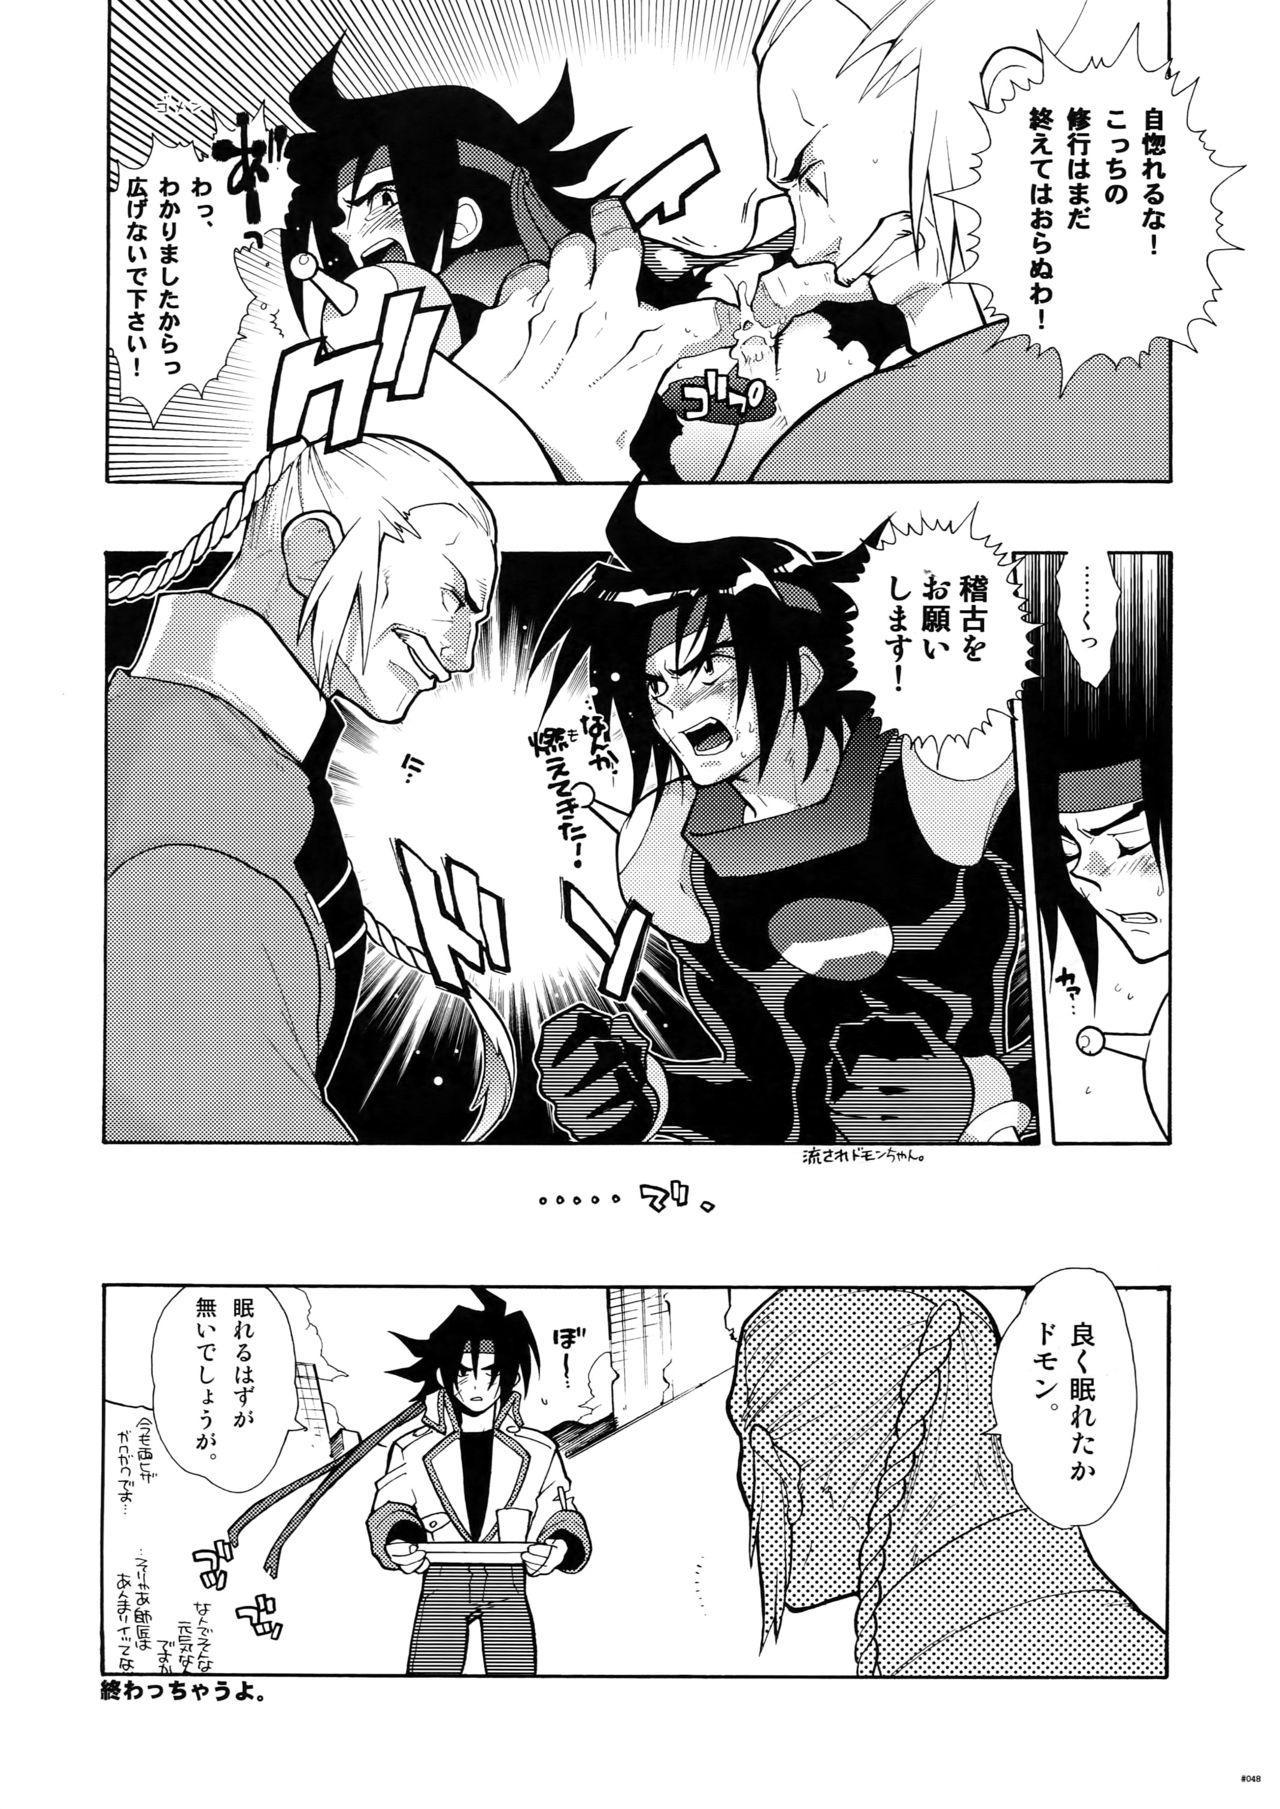 [Article 60 of Criminal Code (Shuhan)] G-gan Josei-Muke Sairoku-Shuu (G Gundam) 47